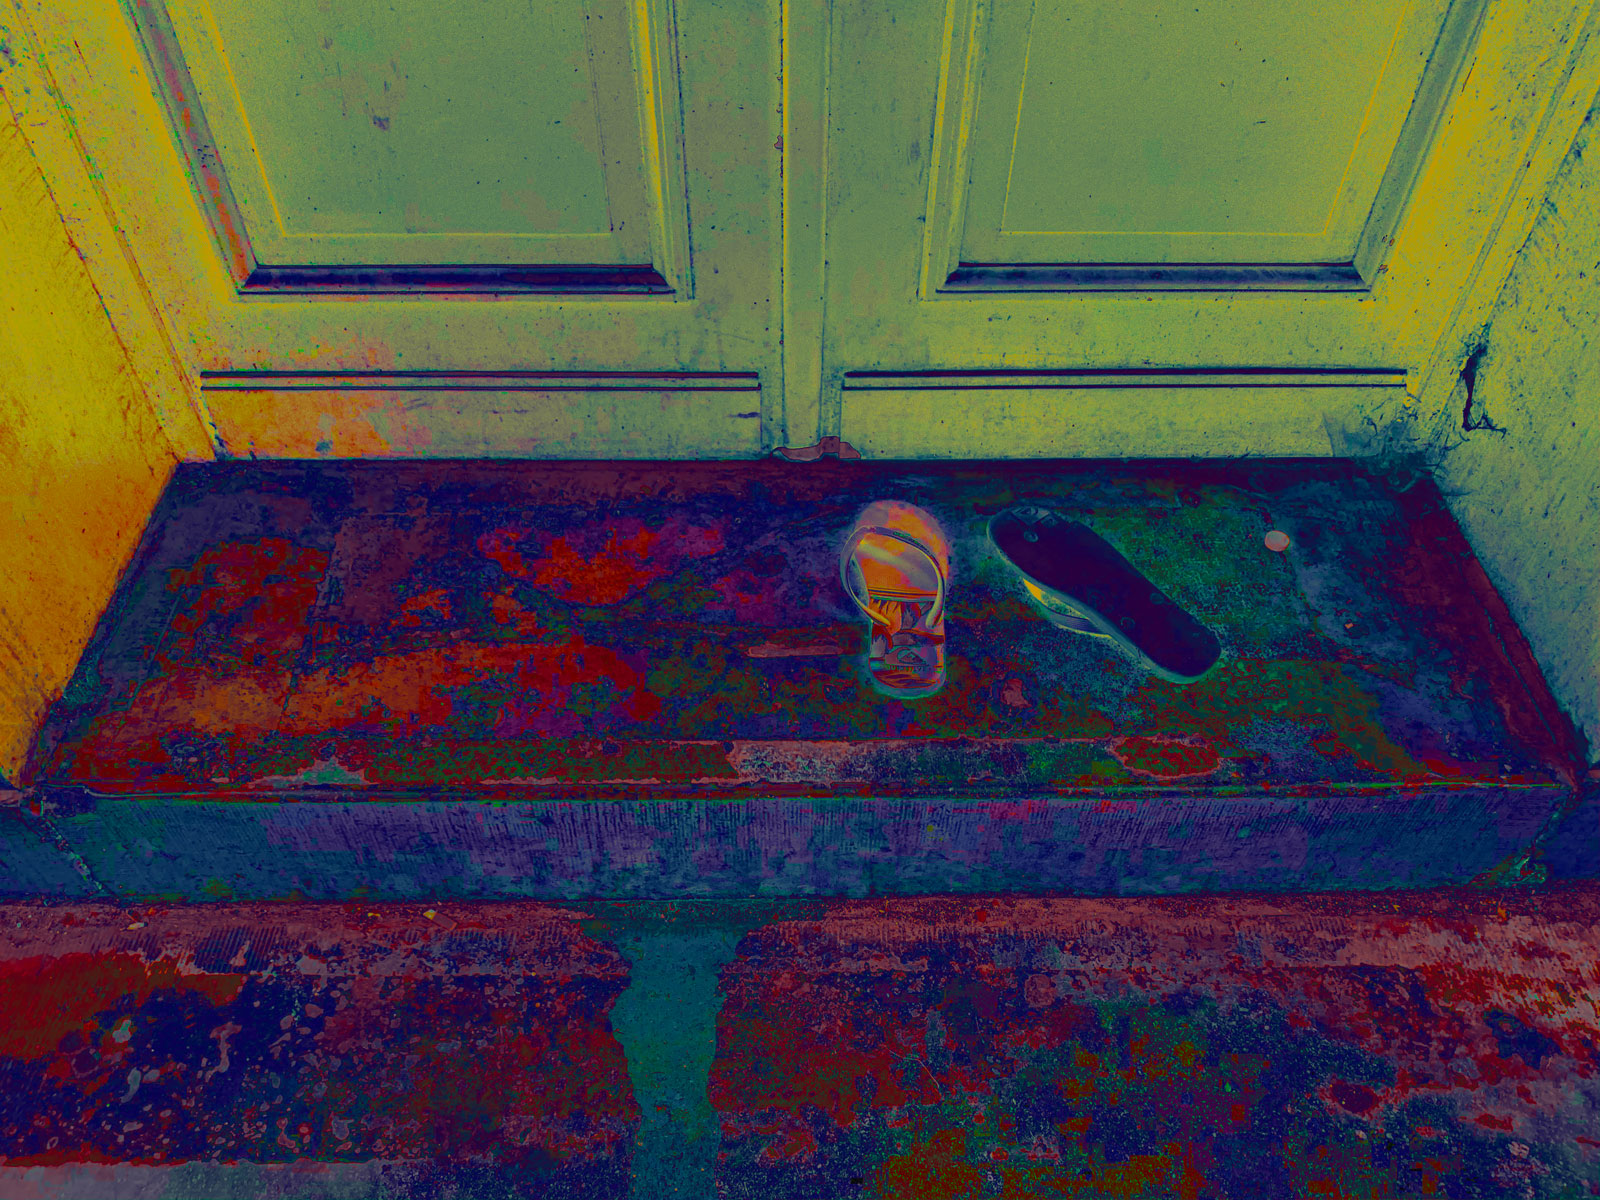 Lost & Found - Pimped Garbage 05 • 70 x 52.5 cm (27.56 x 20.67 in)